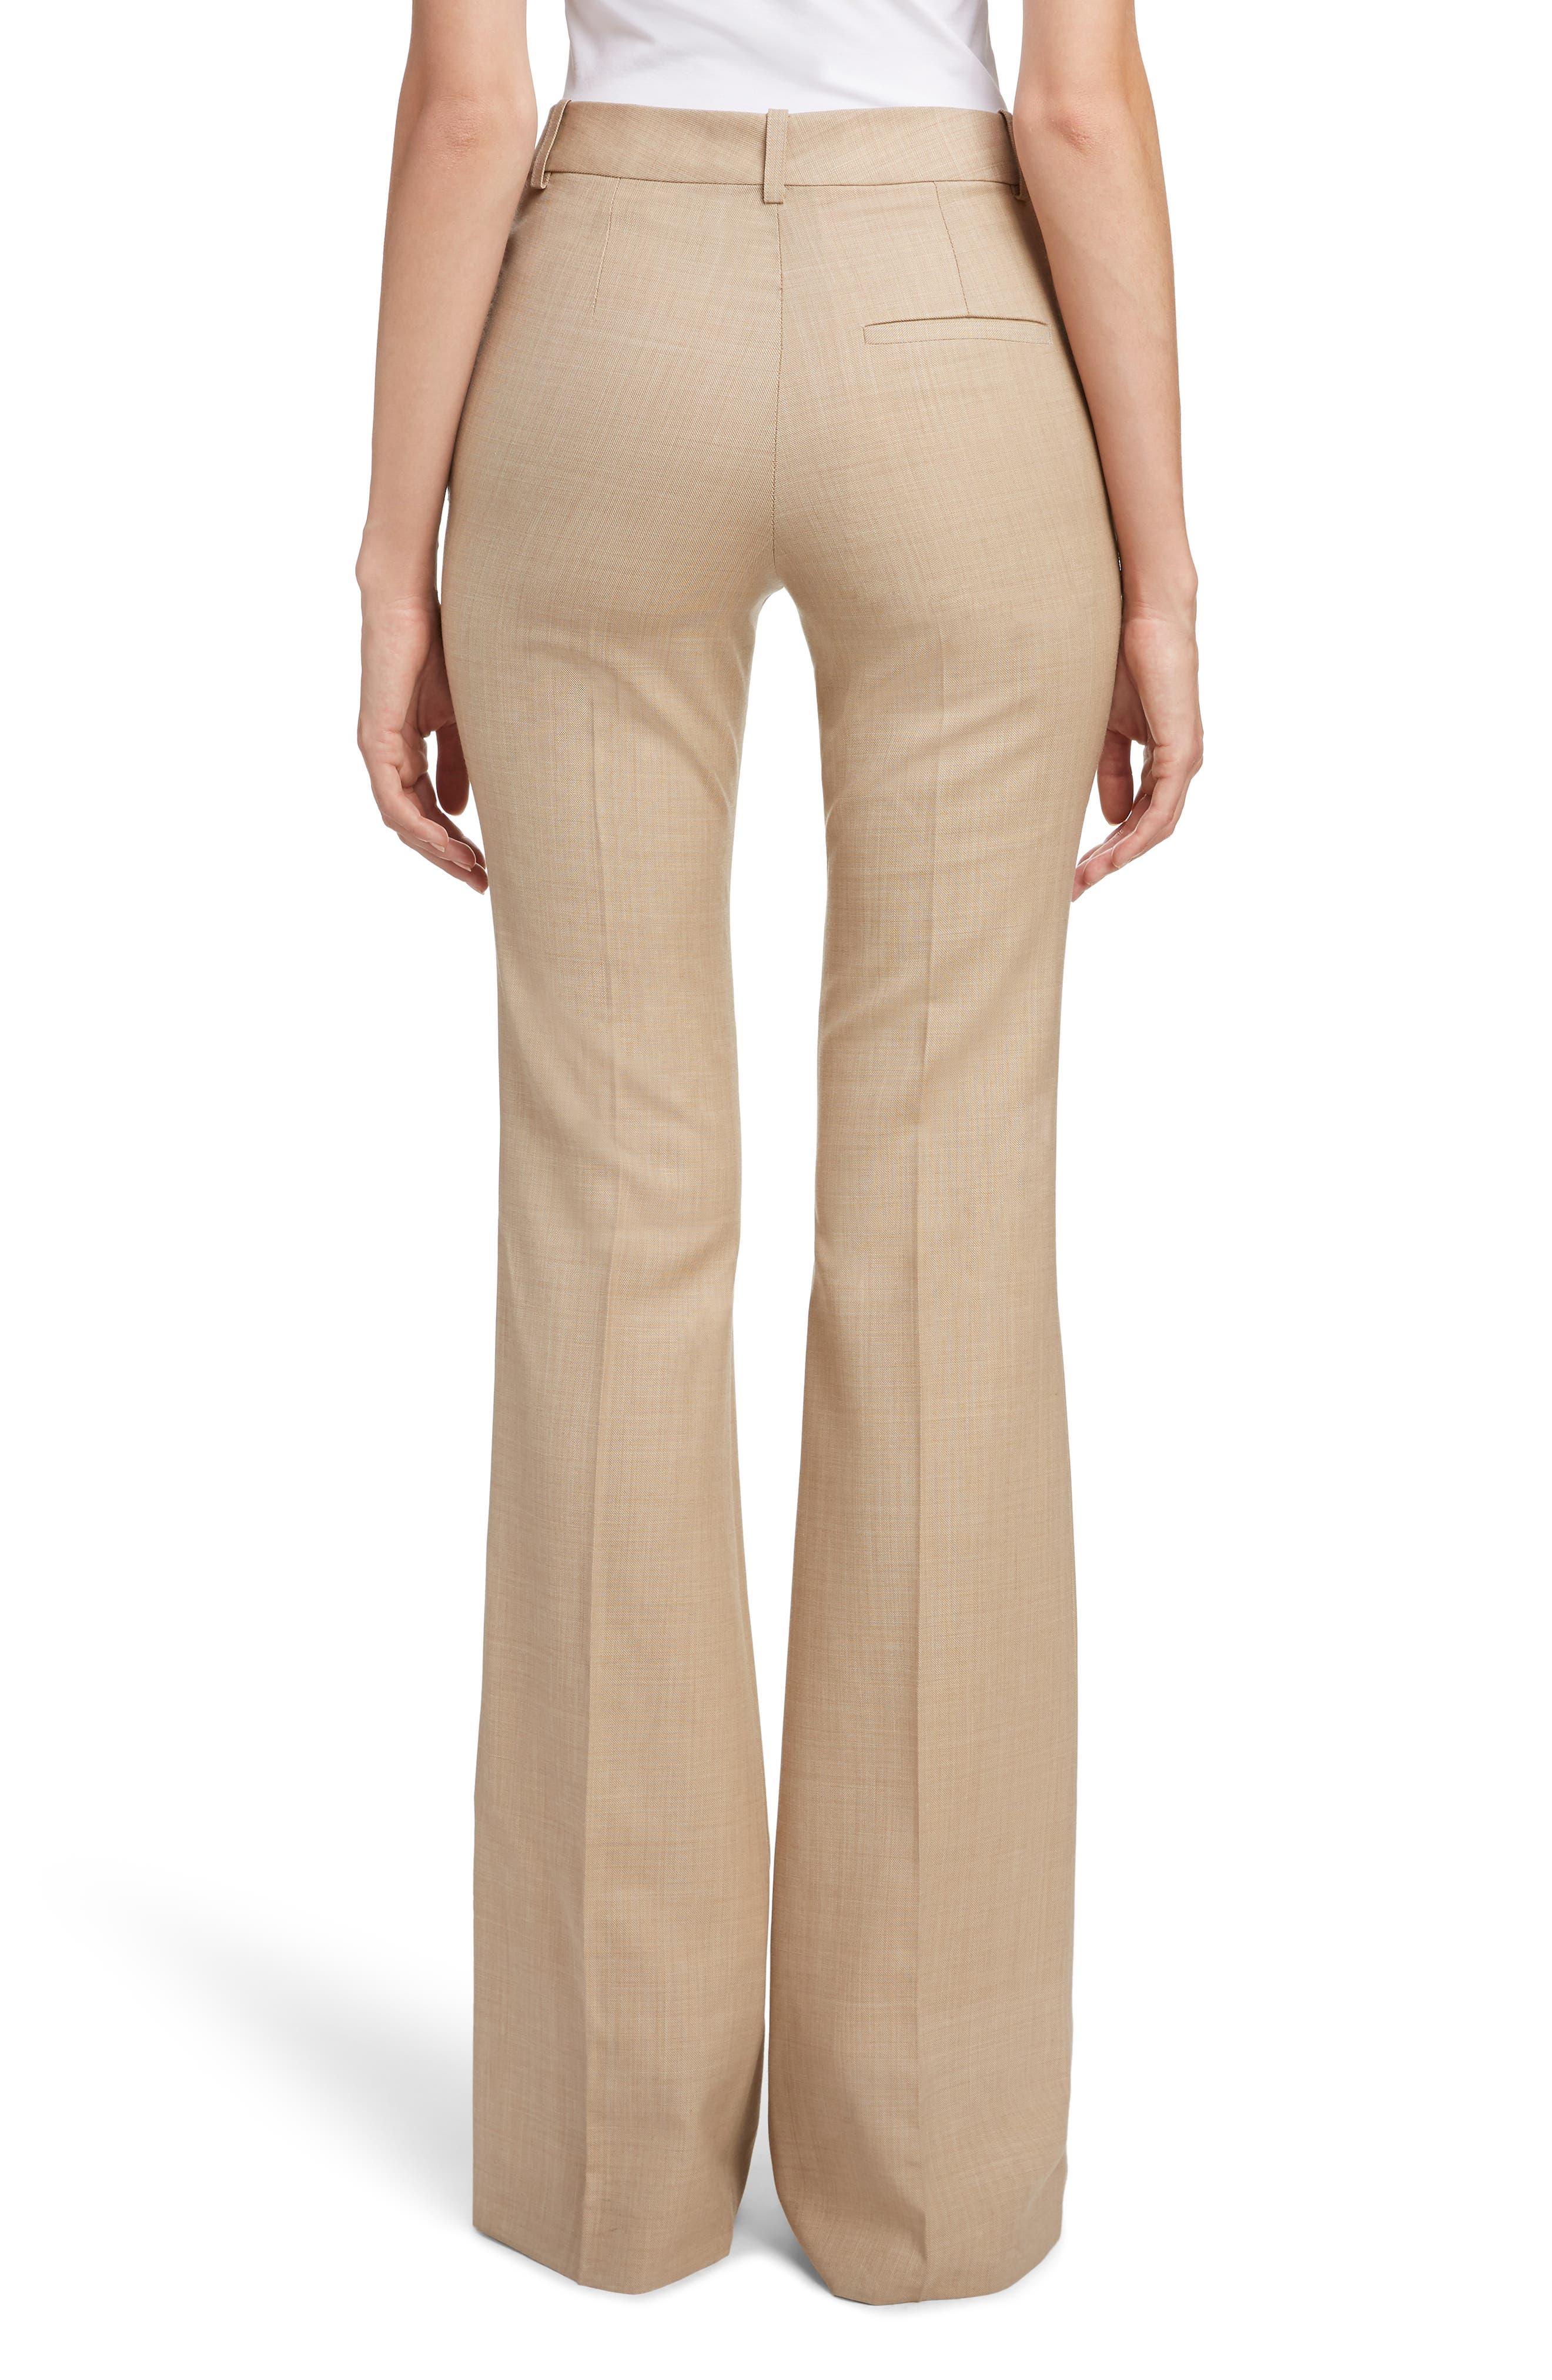 VICTORIA BECKHAM, High Waist Flare Wool Pants, Alternate thumbnail 2, color, LIGHT BEIGE-WHITE